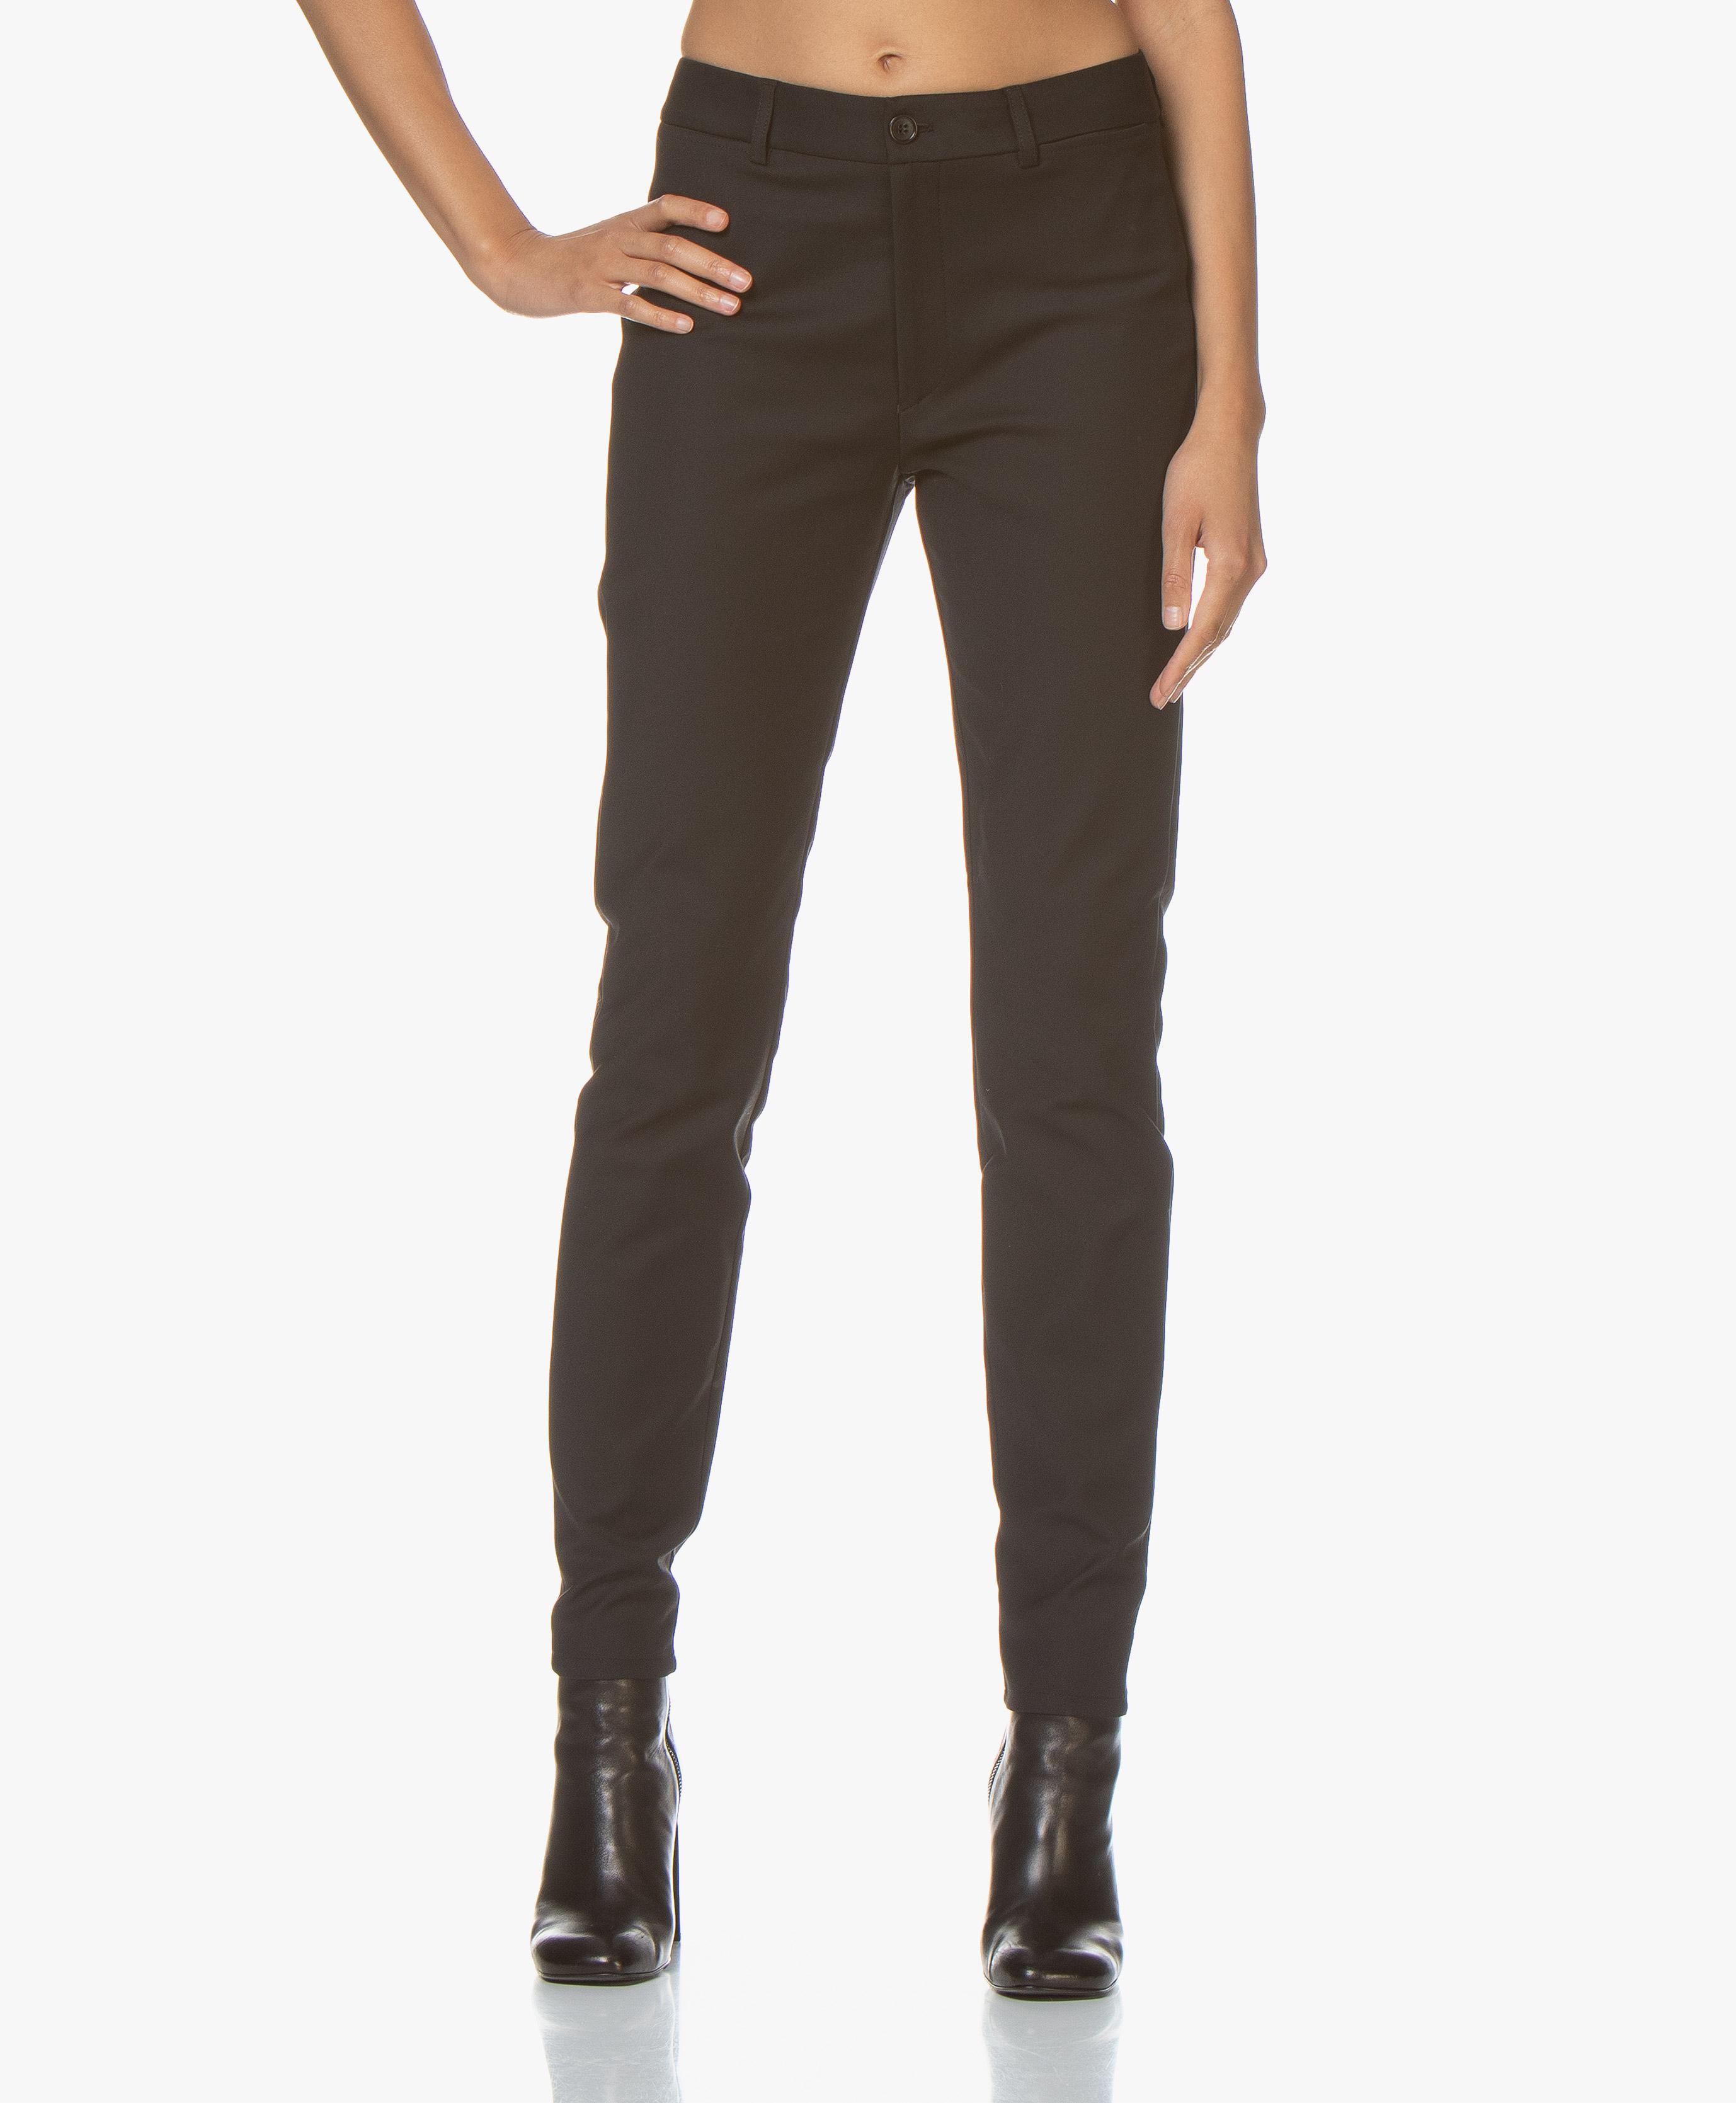 Filippa K Millie Pants Black 26693 1433 | Perfectly Basics